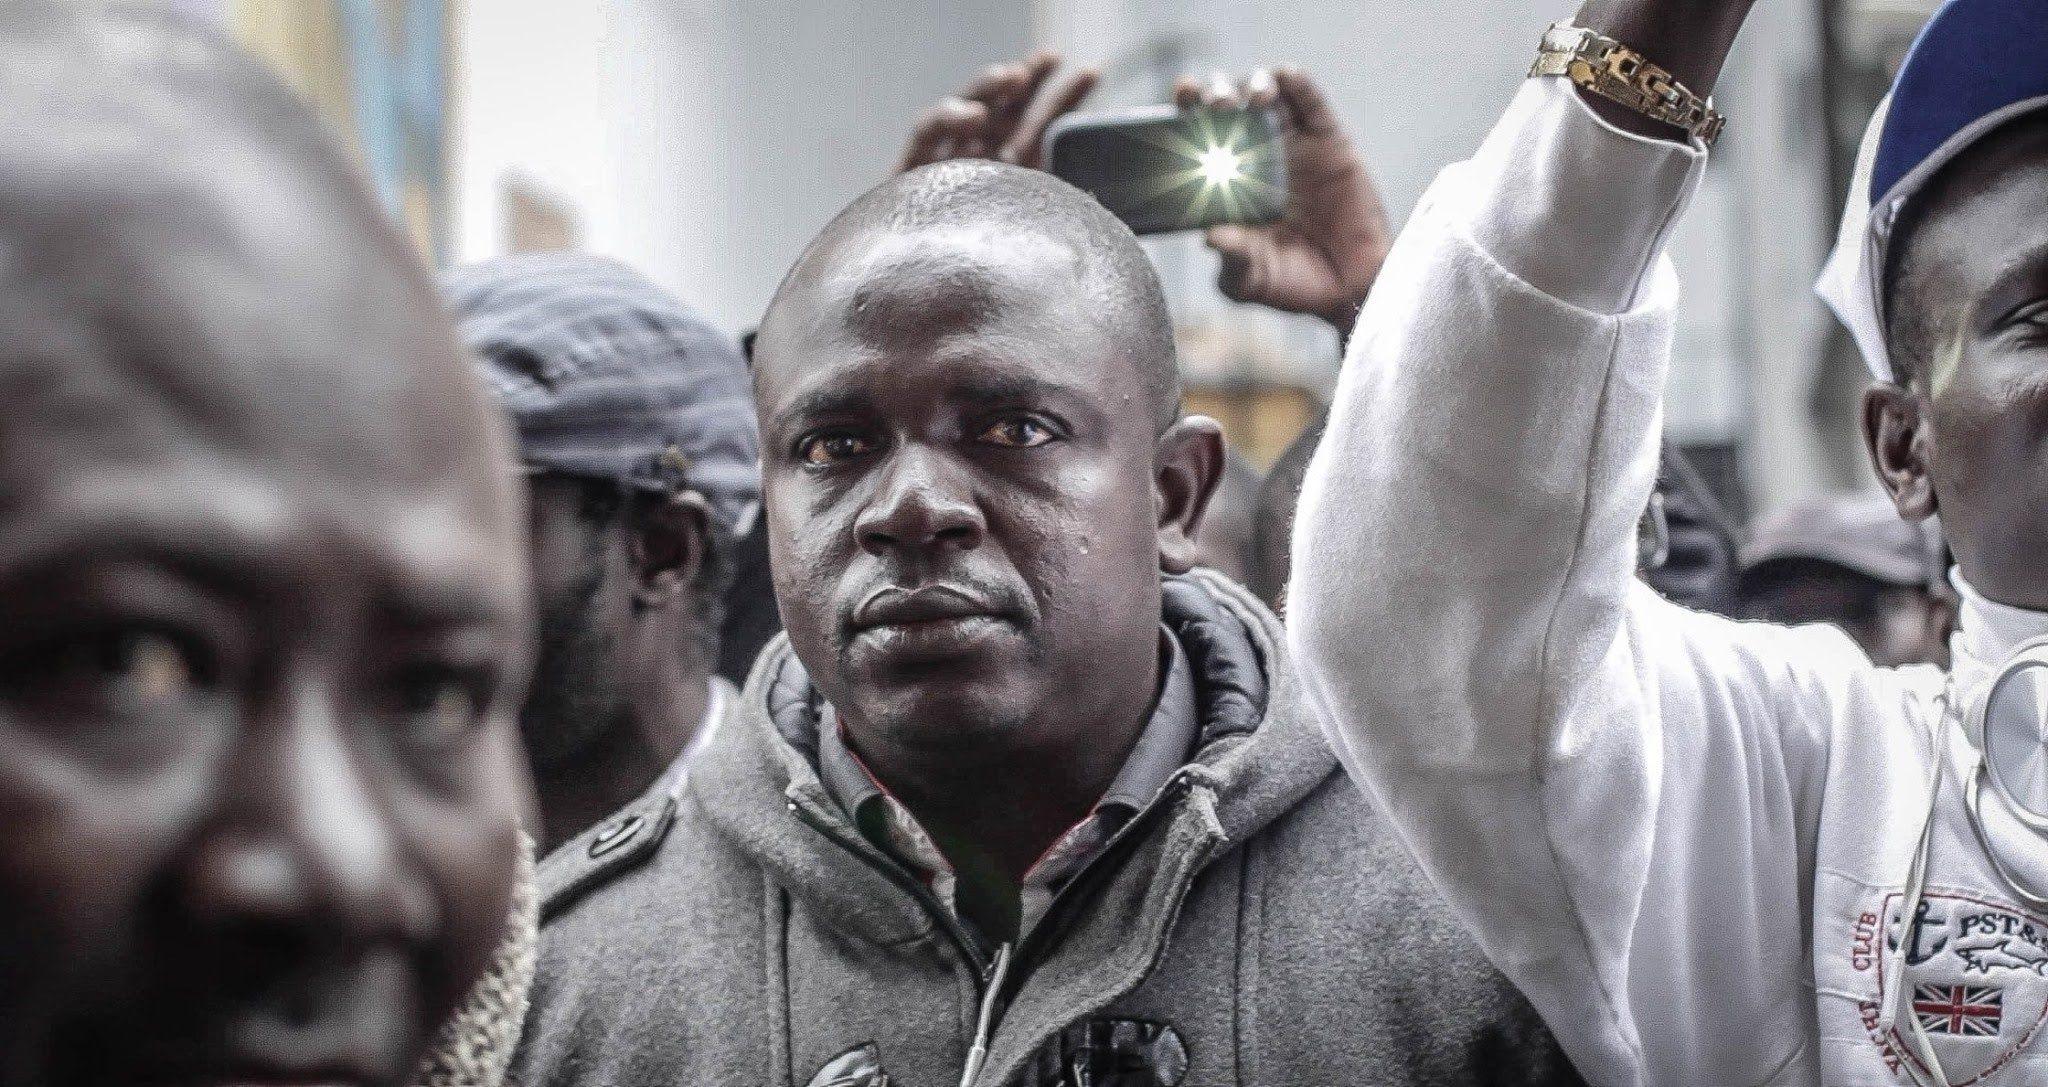 Marcha de vendedores ambulantes africanos